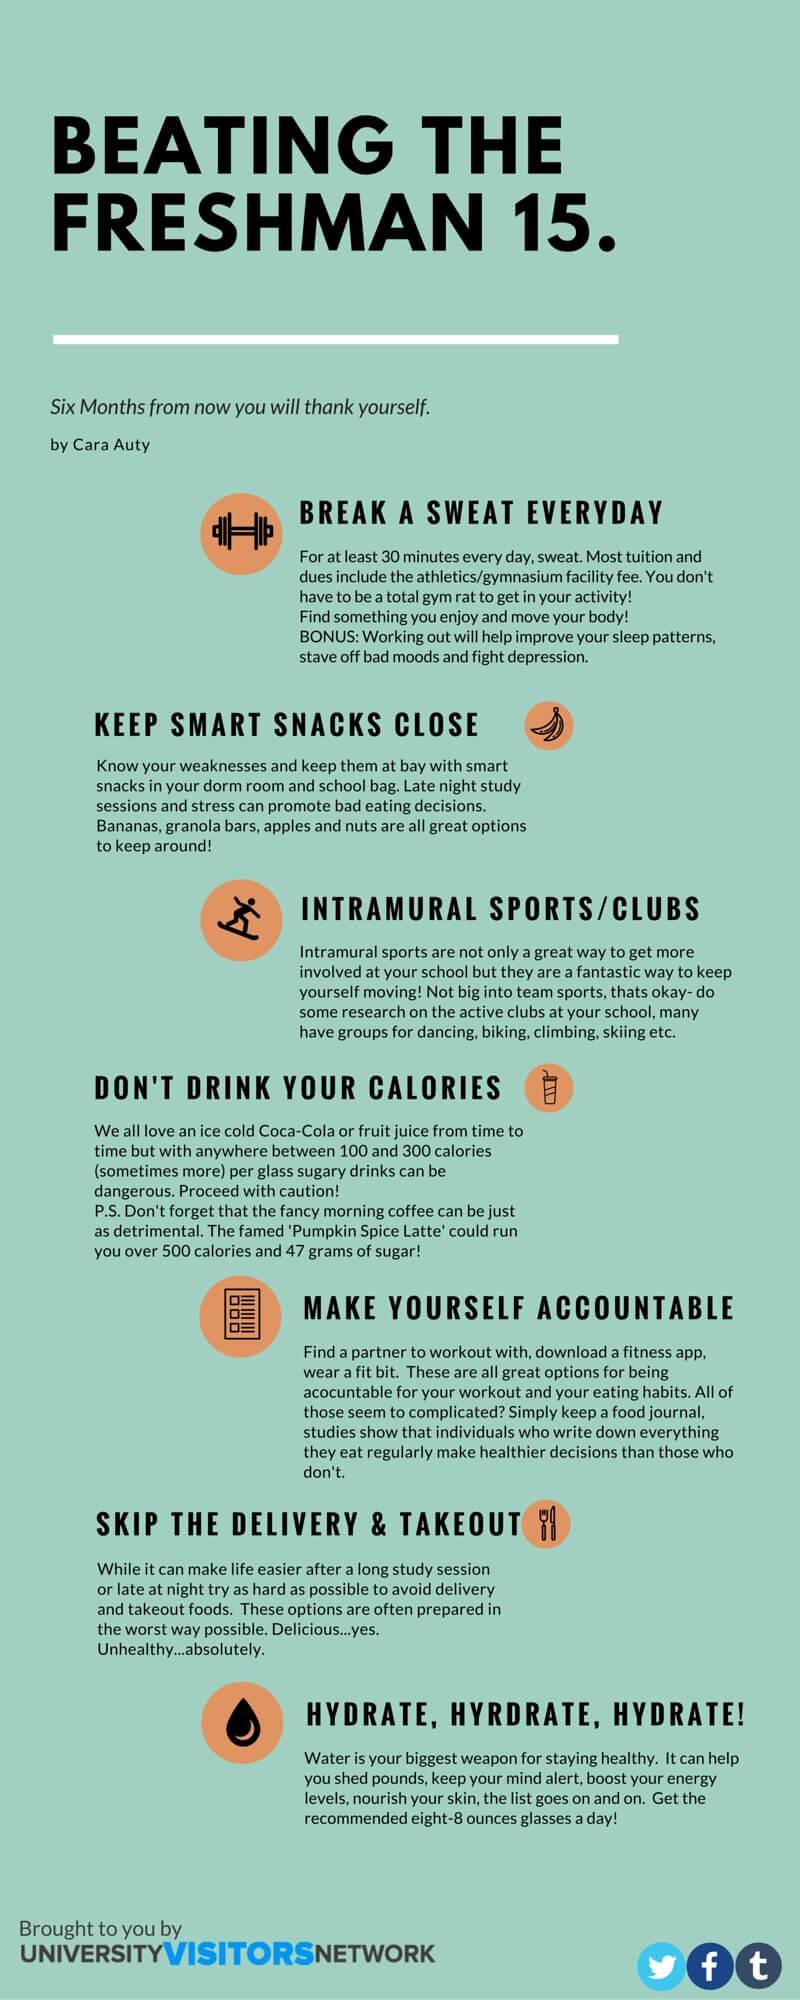 Beat the Freshman 15 Infographic